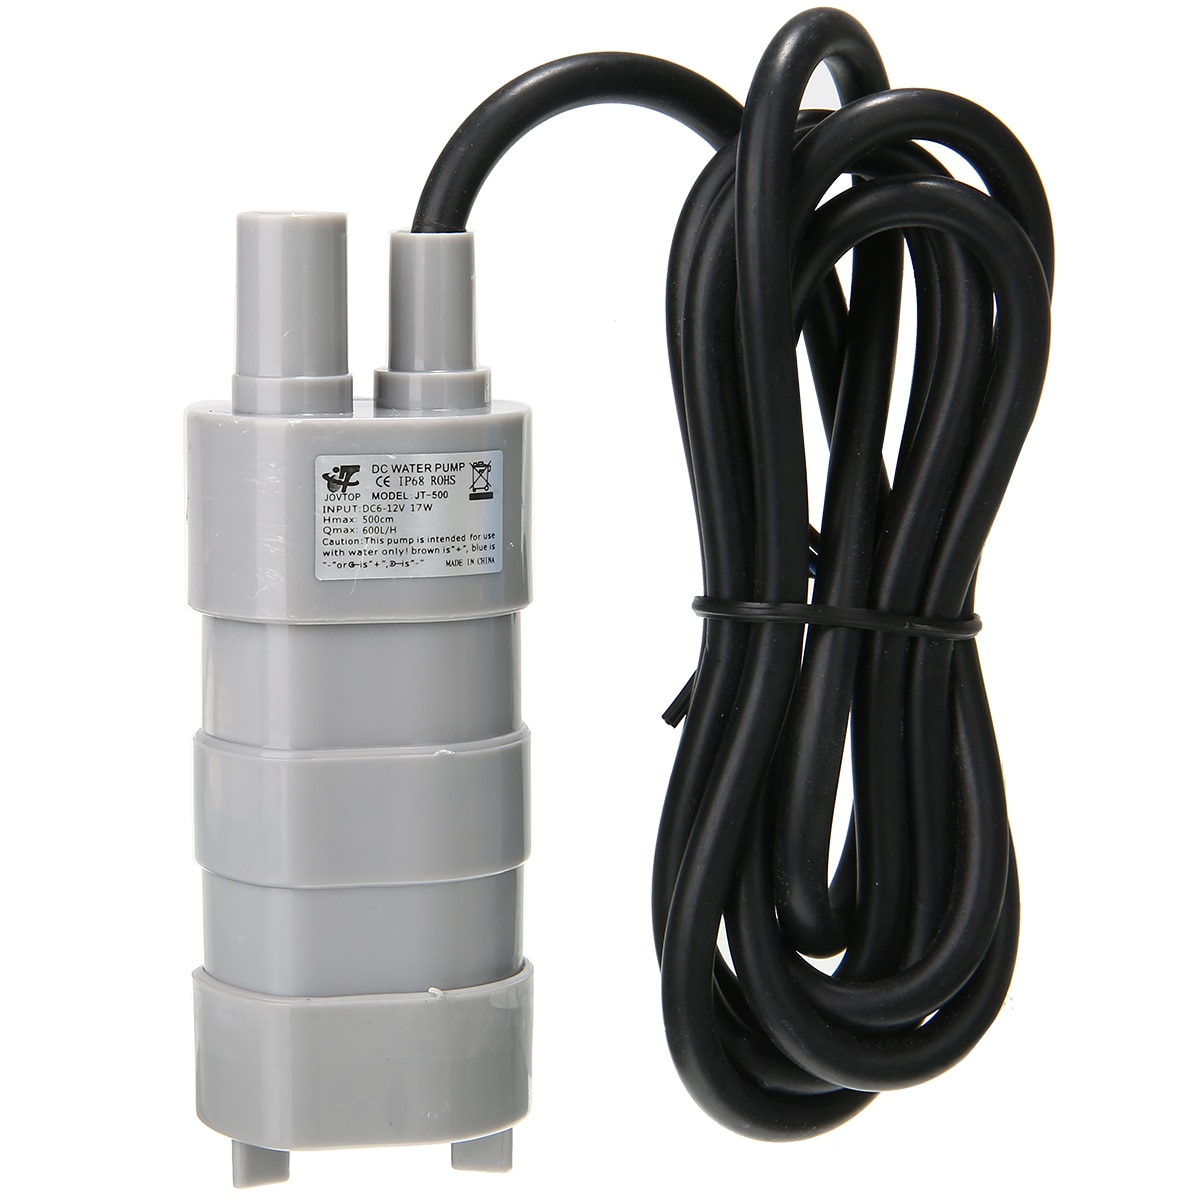 600L/H 12V High Flow Water Pump Submersible Water Pump 5M For Fish Tank Change Water Camper Caravan Motorhome